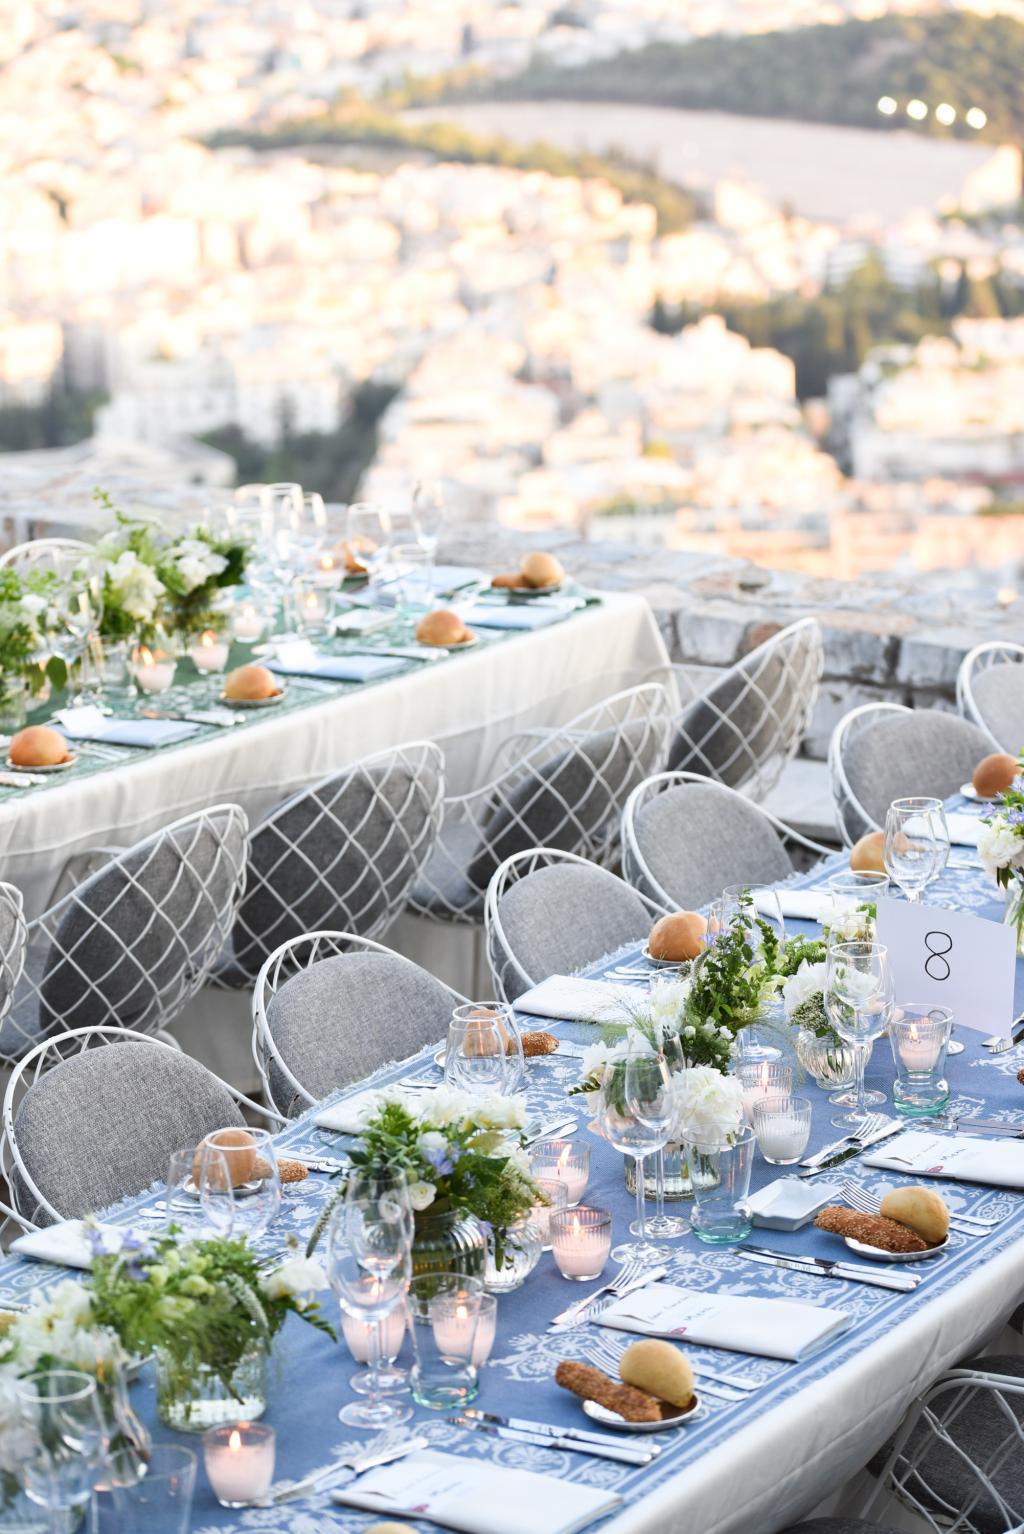 A&A Athens wedding - Image 18